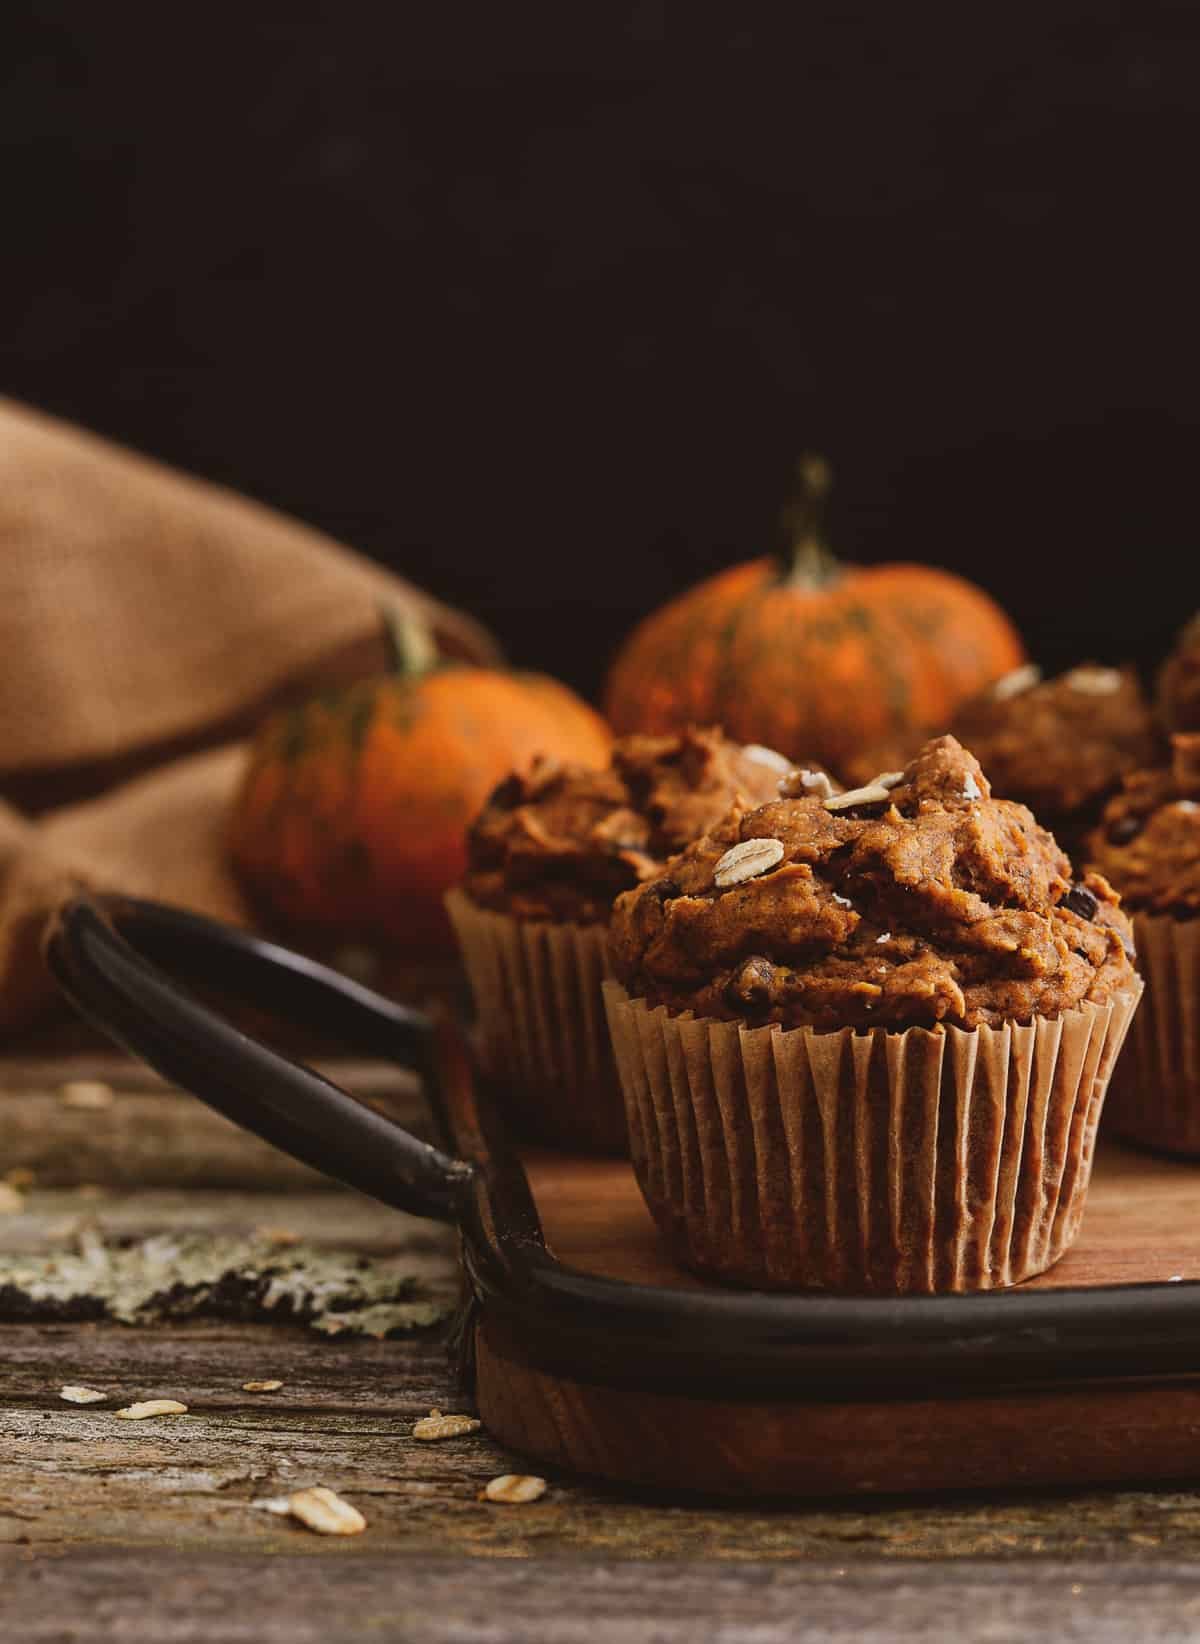 Vegan pumpkin muffin on serving tray.